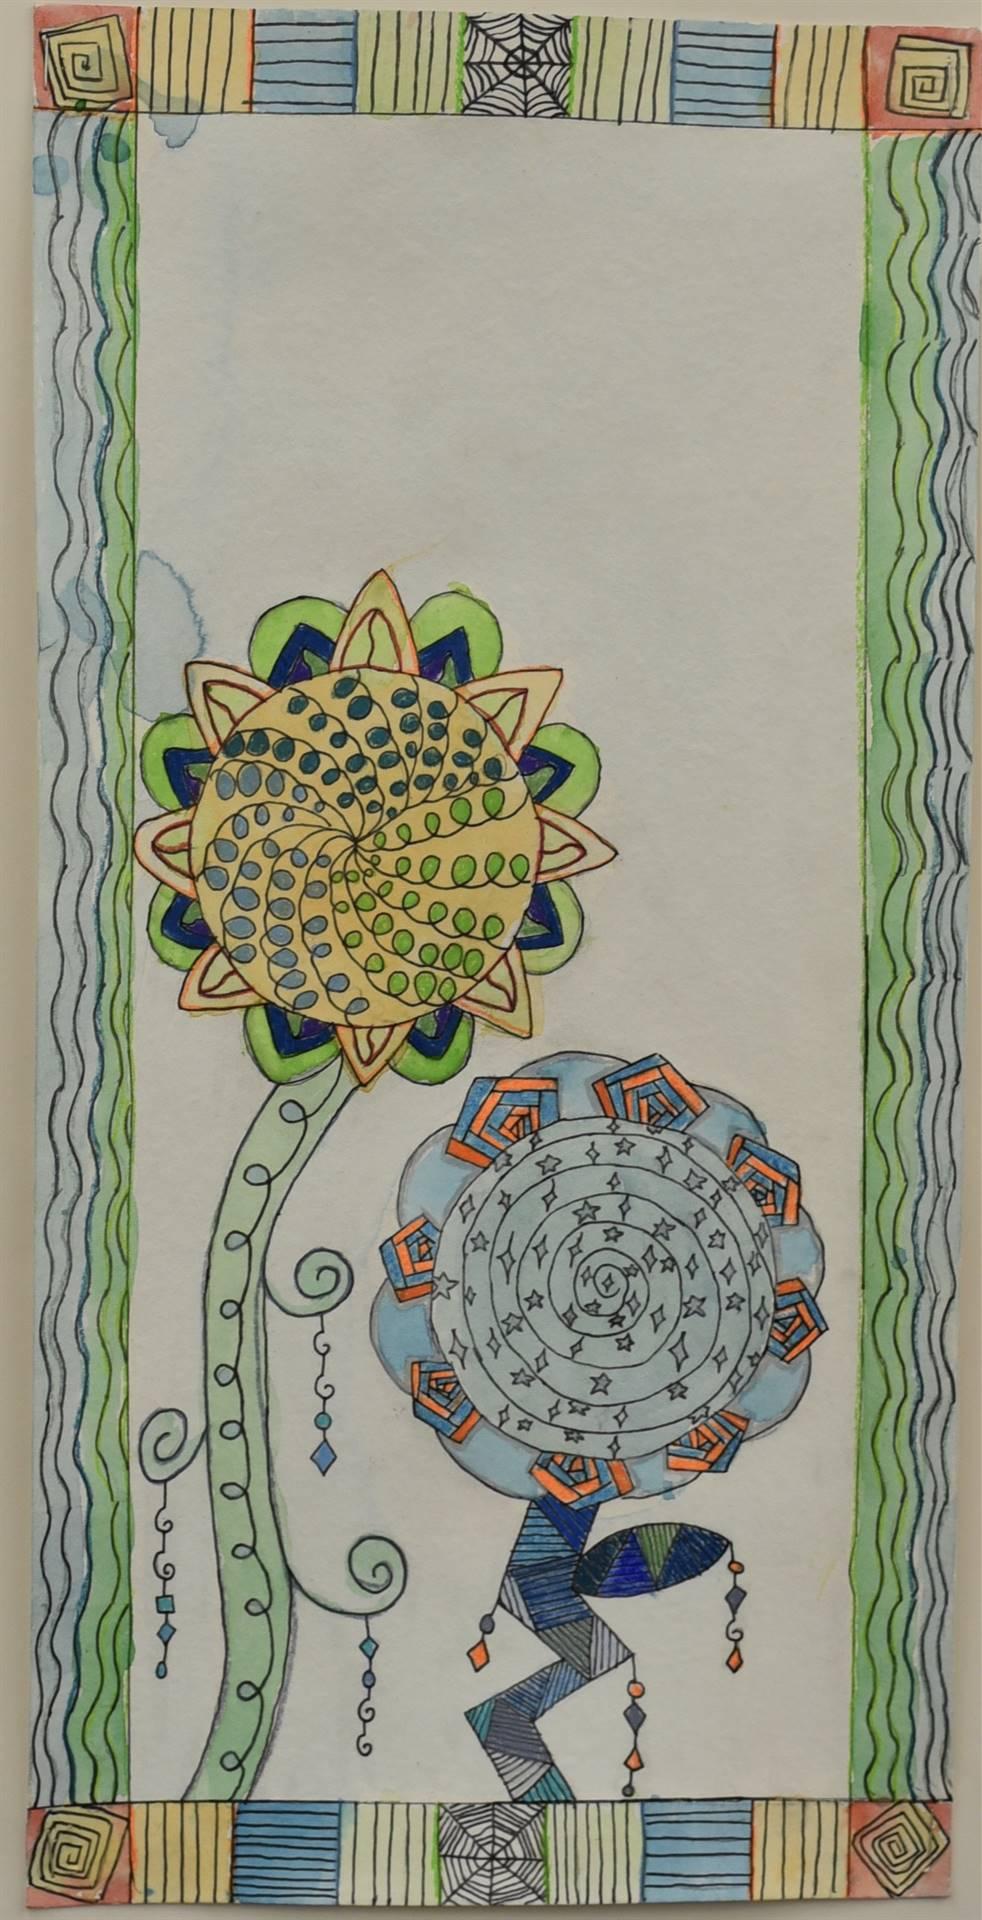 Brecksville-Broadview Hts. Middle School Art Projects 169